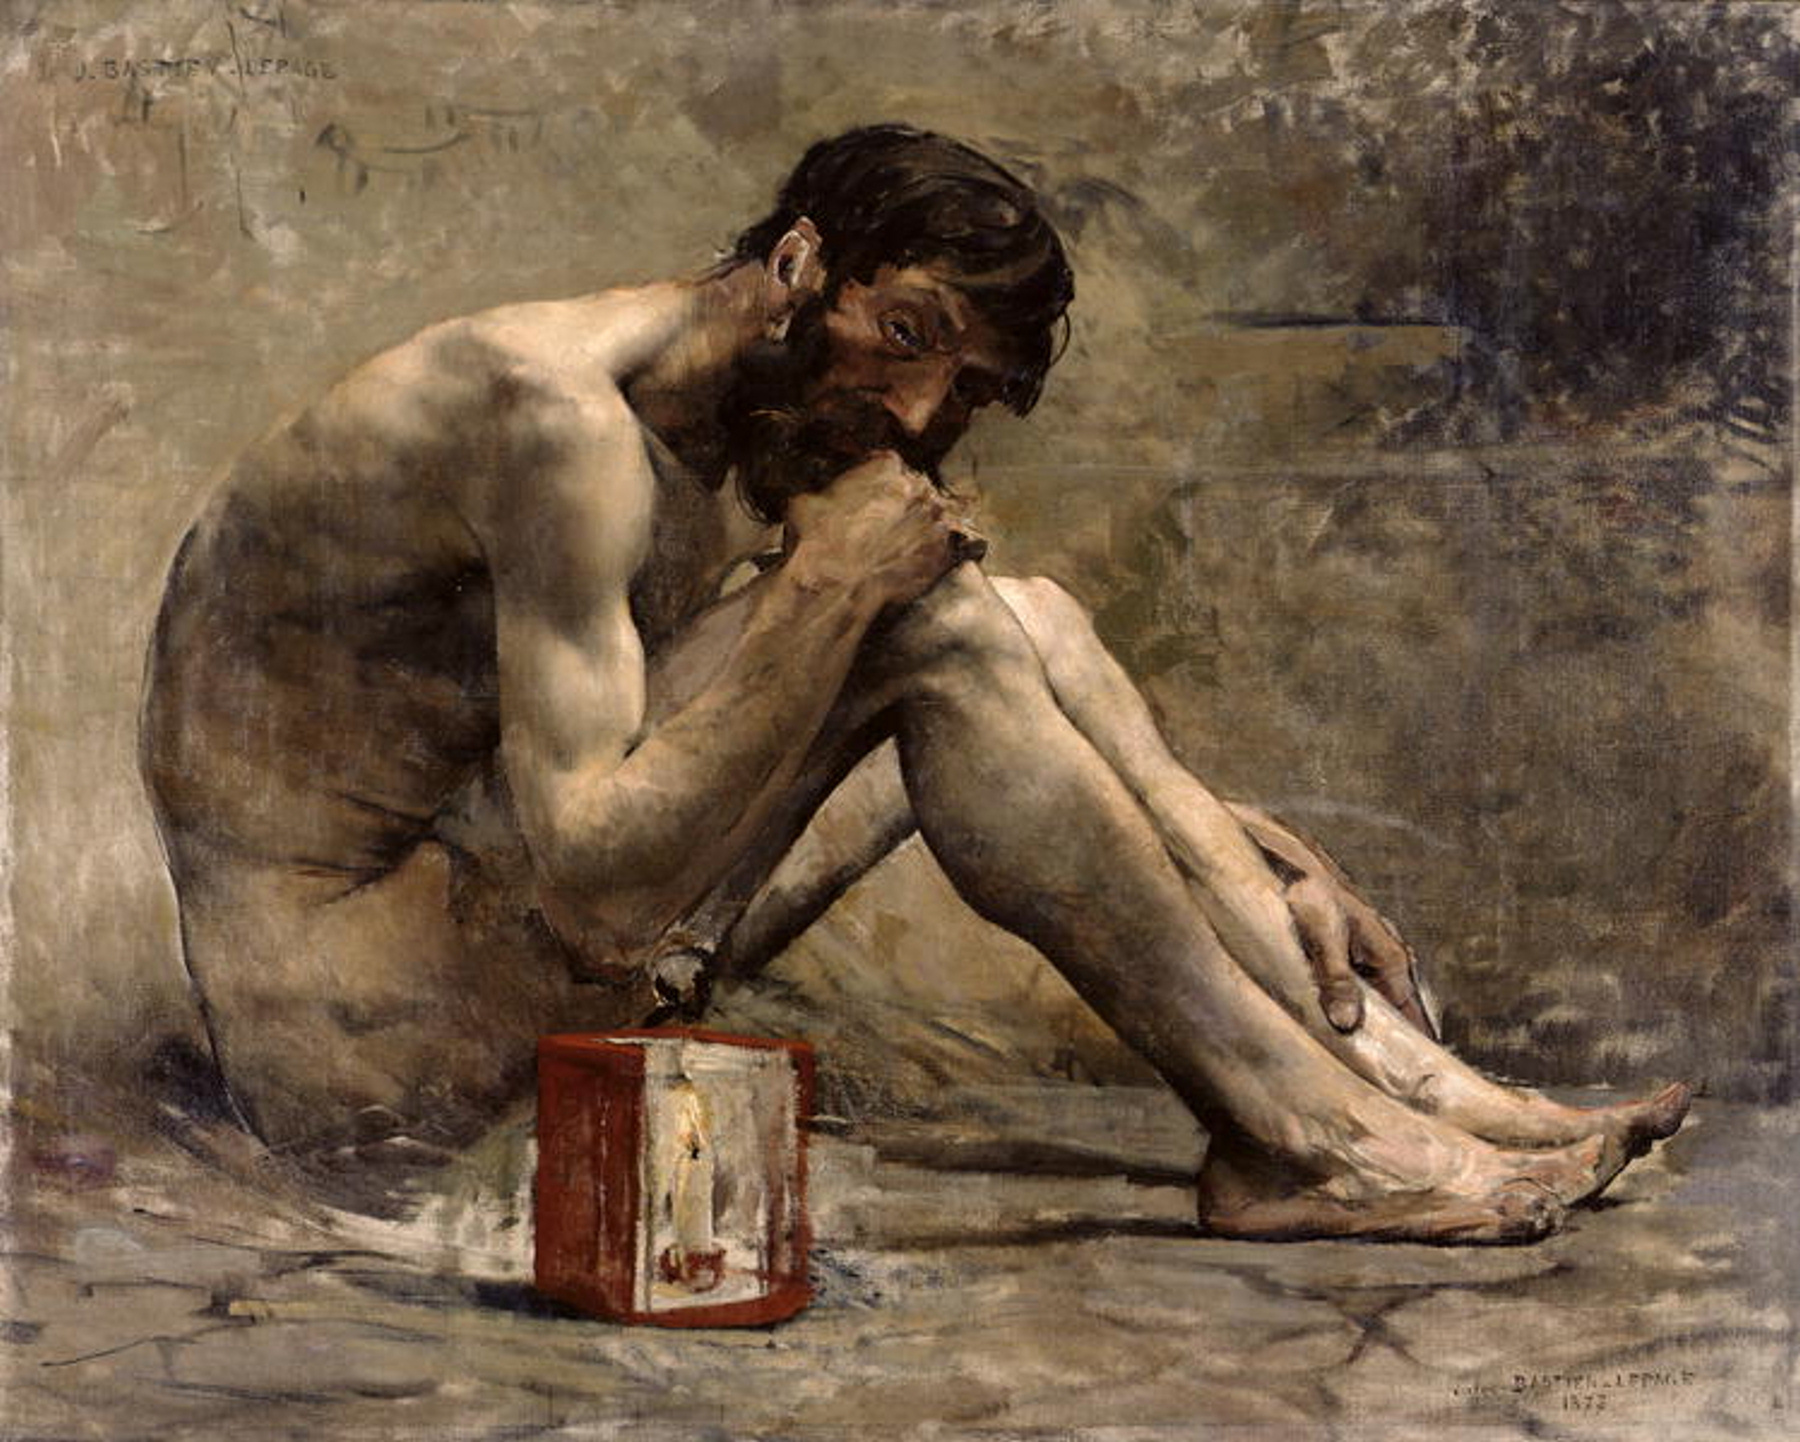 Jules Bastien-Lepage, Diogenes